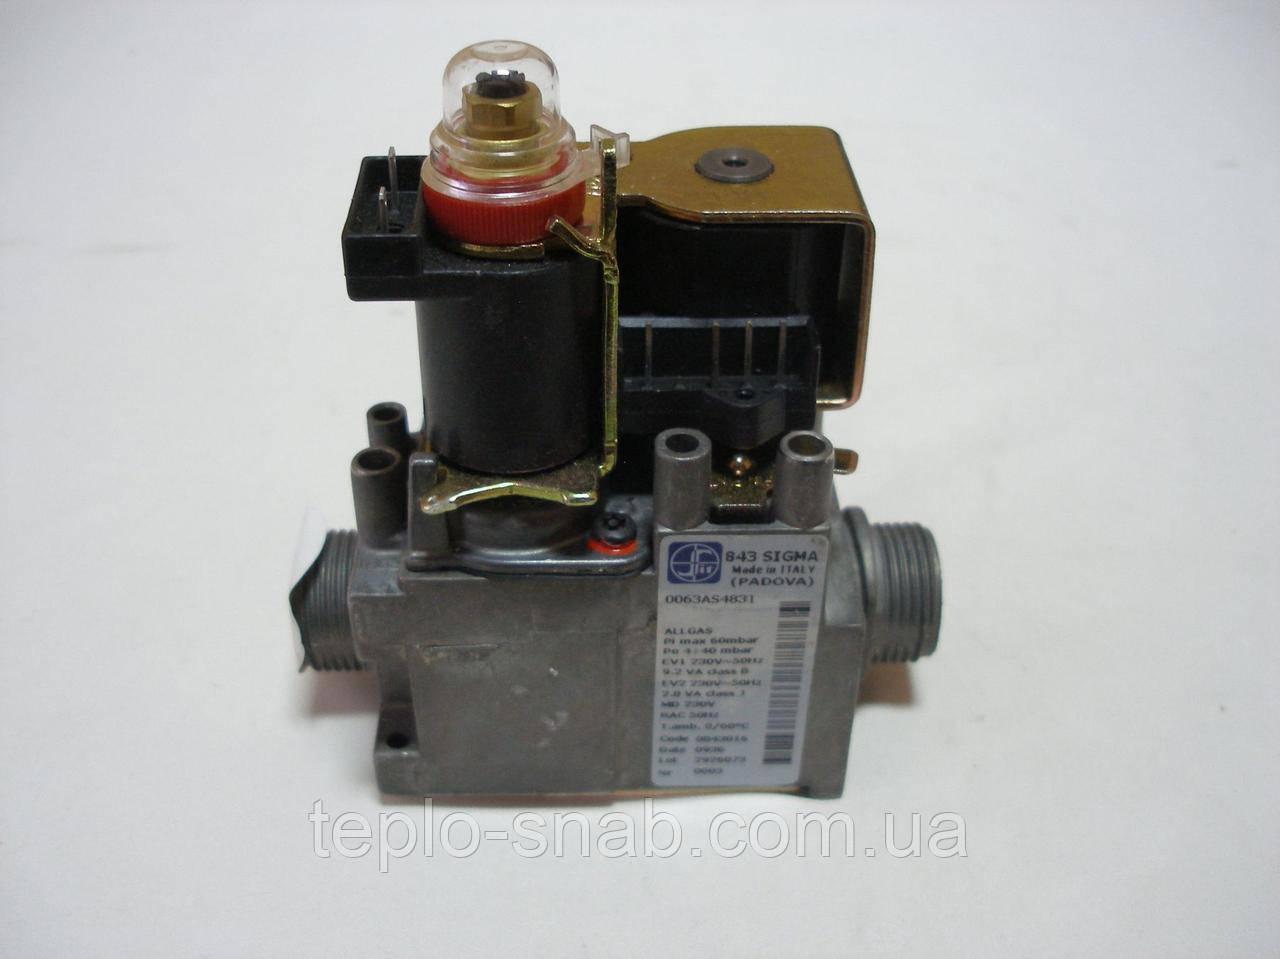 Газовый клапан 843 SIGMA энергонезависимый - . 0.843.016,Proterm KLO 20-30-40-50kw - 20025317